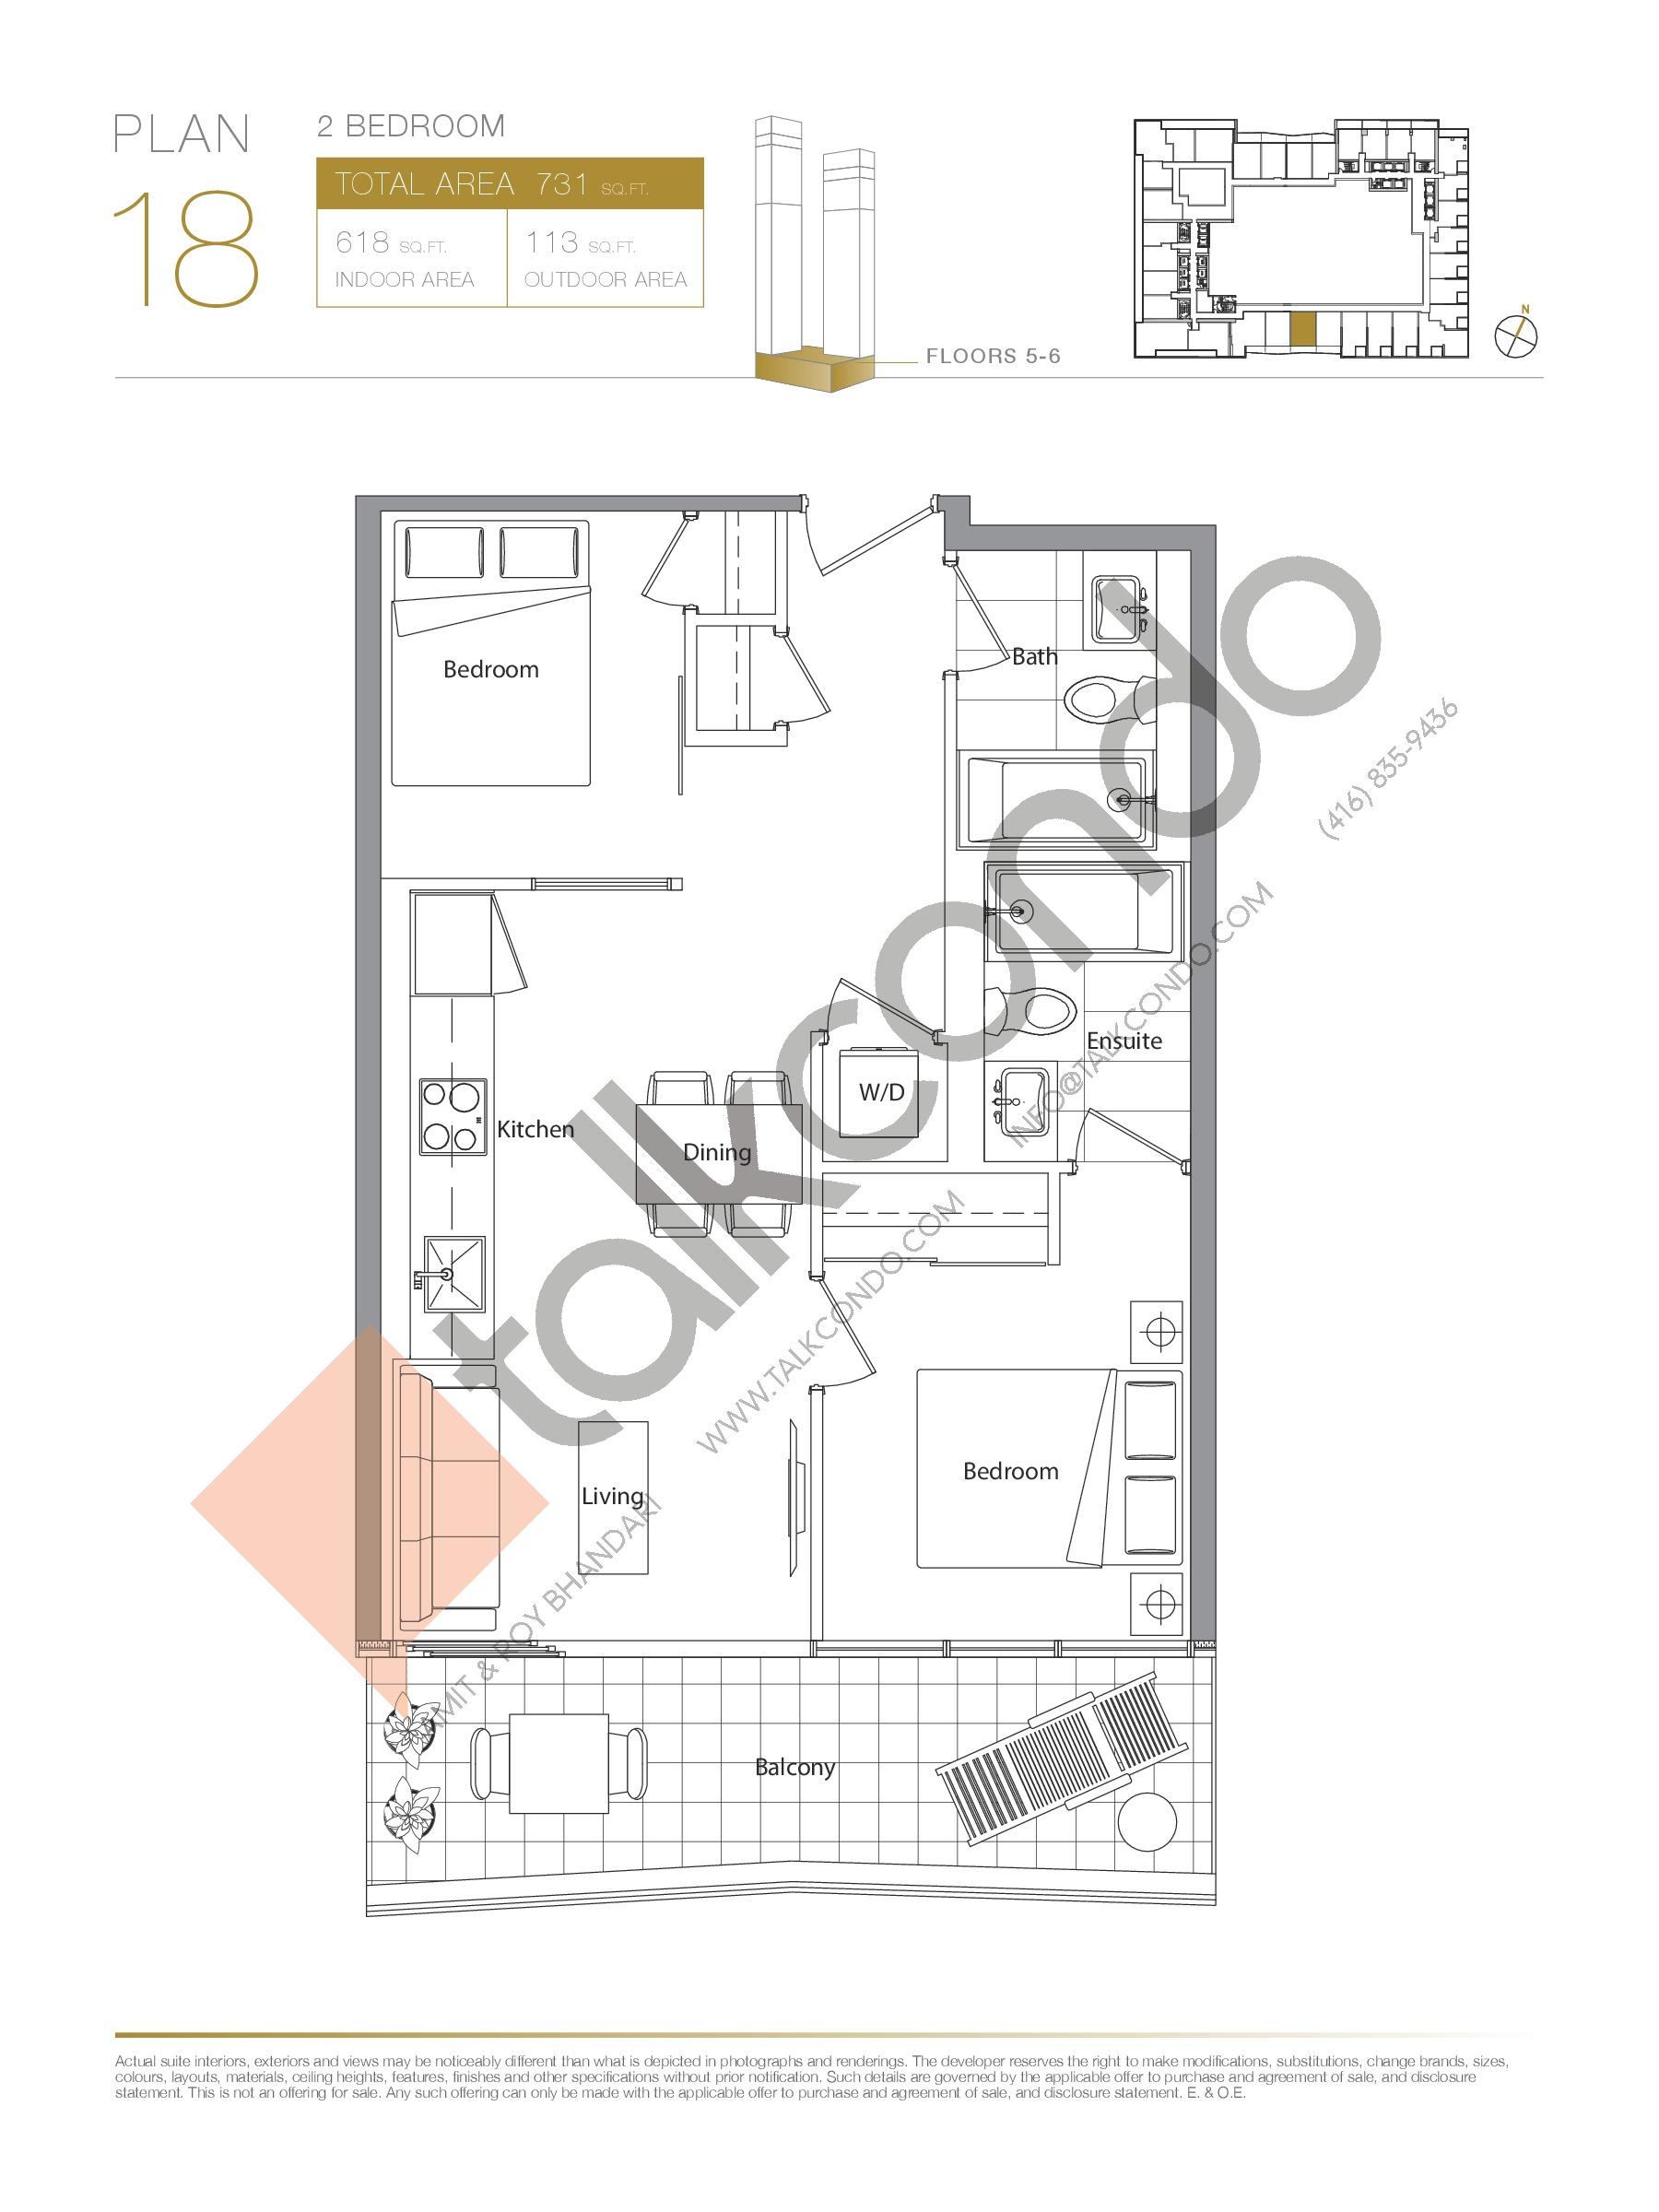 Plan 18 - Podium Floor Plan at Concord Canada House Condos - 618 sq.ft